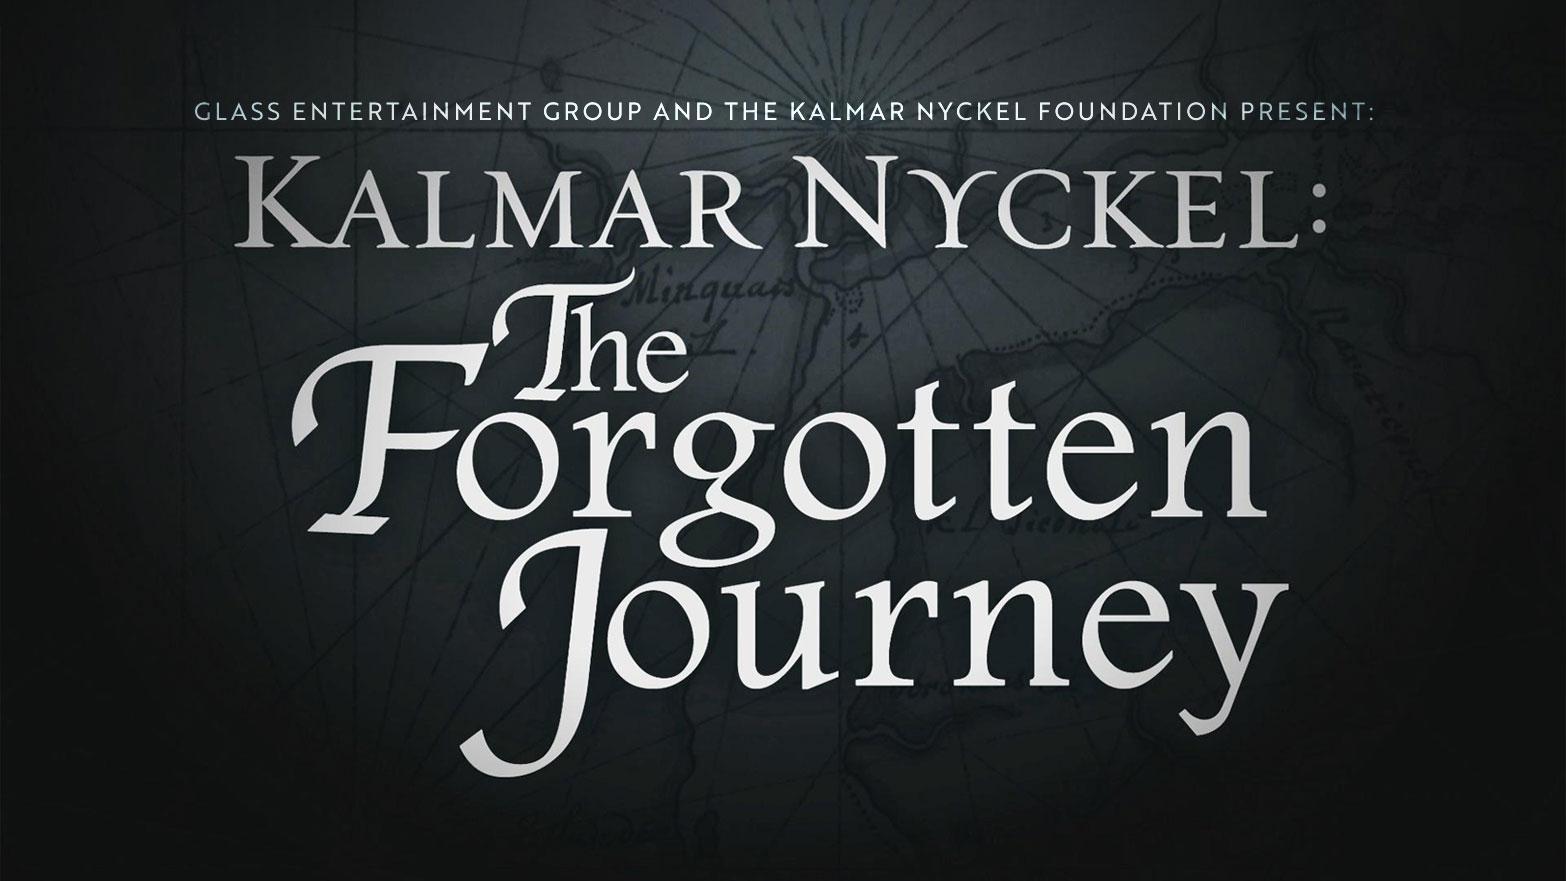 Kalmar Nyckel: The forgotton Journey